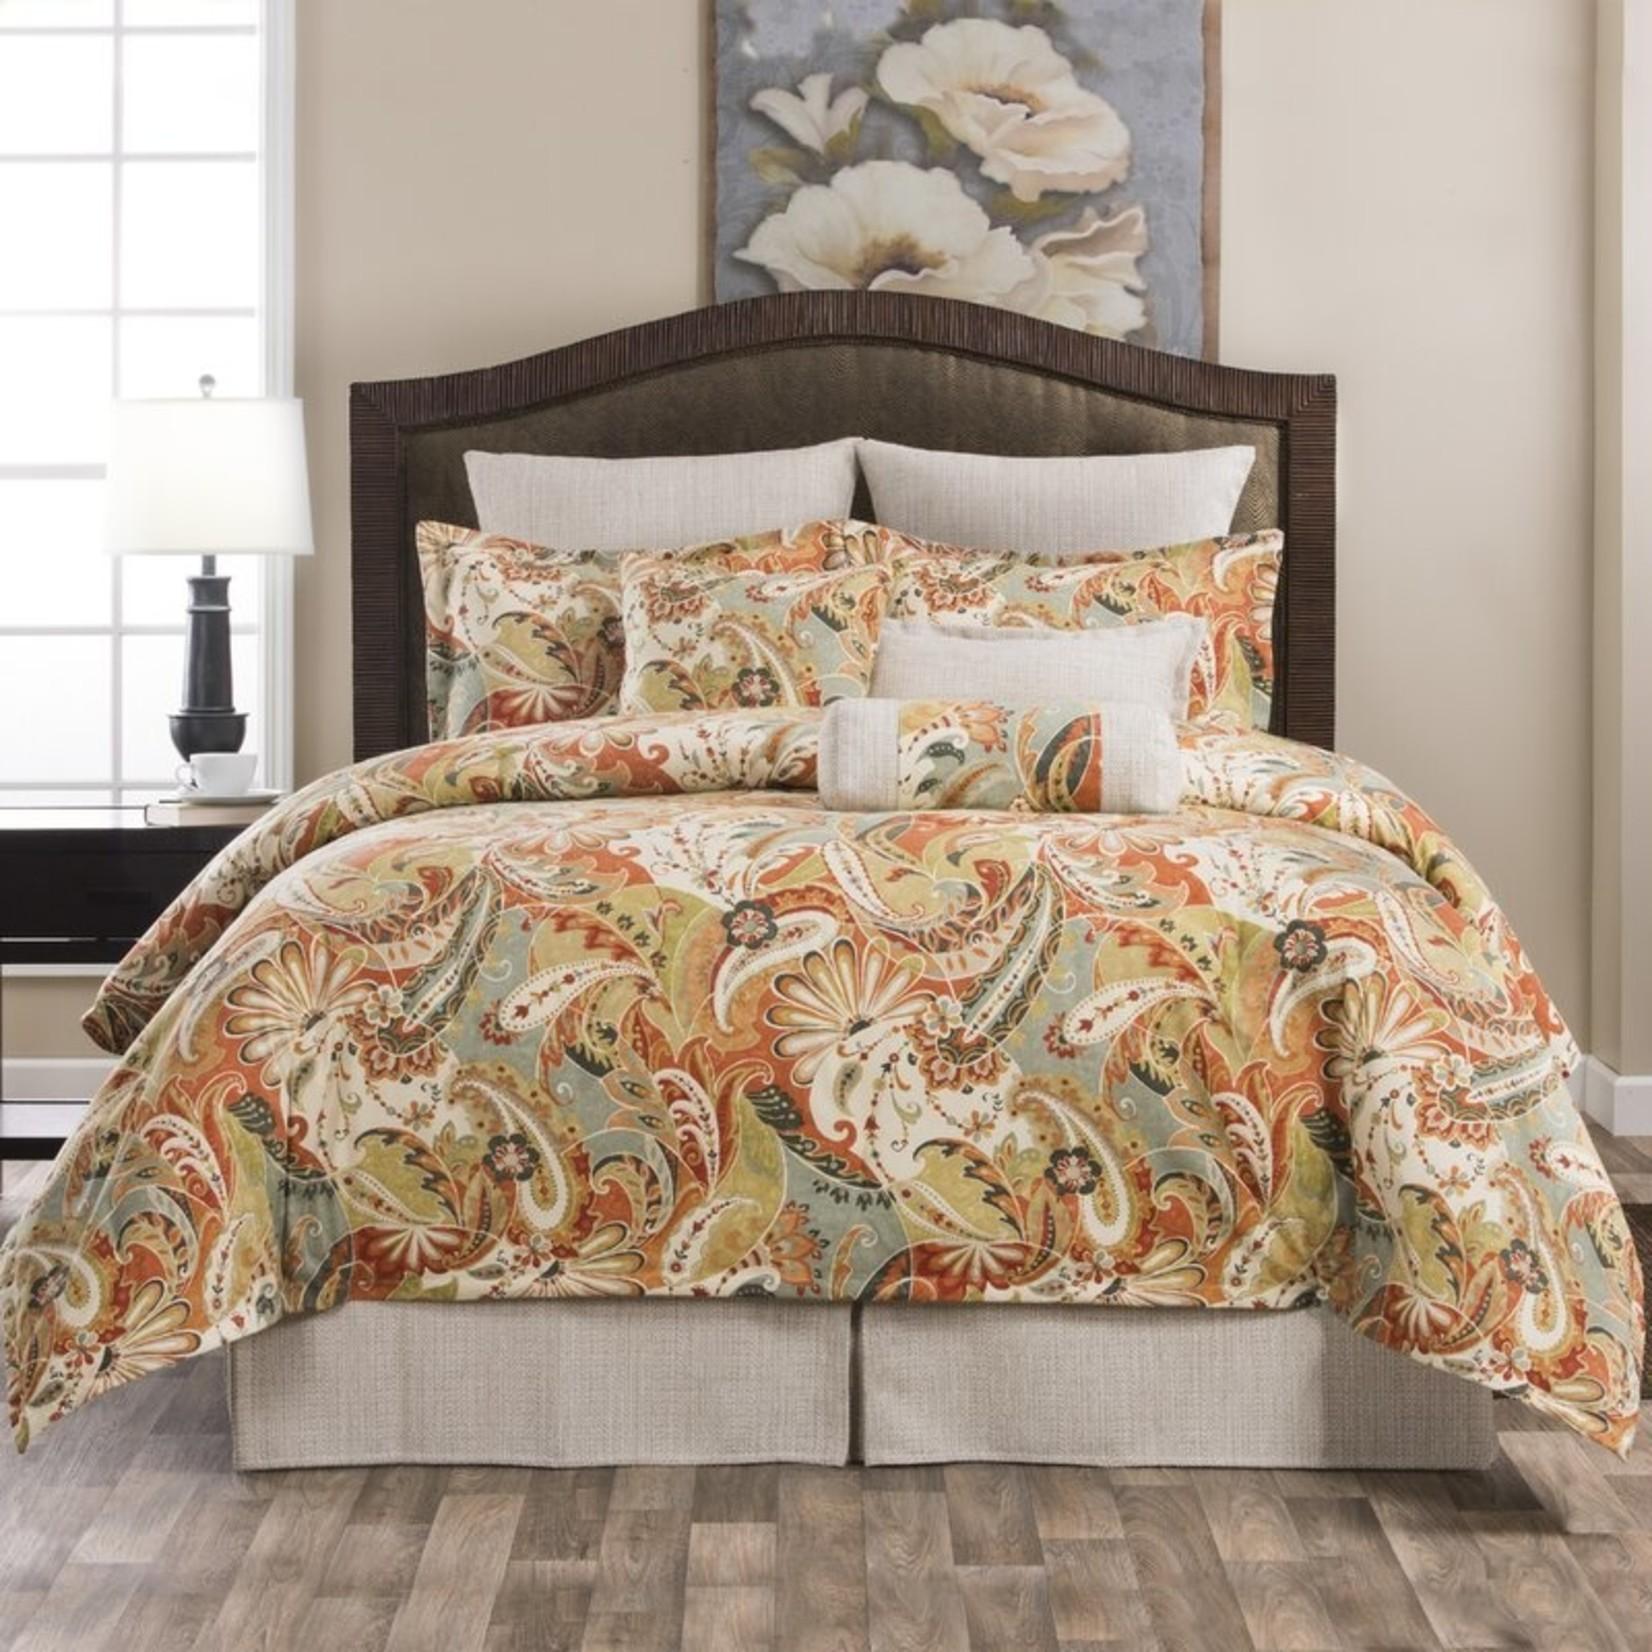 *Queen - Bergen 100% Cotton 4 Piece Comforter Set - Final Sale